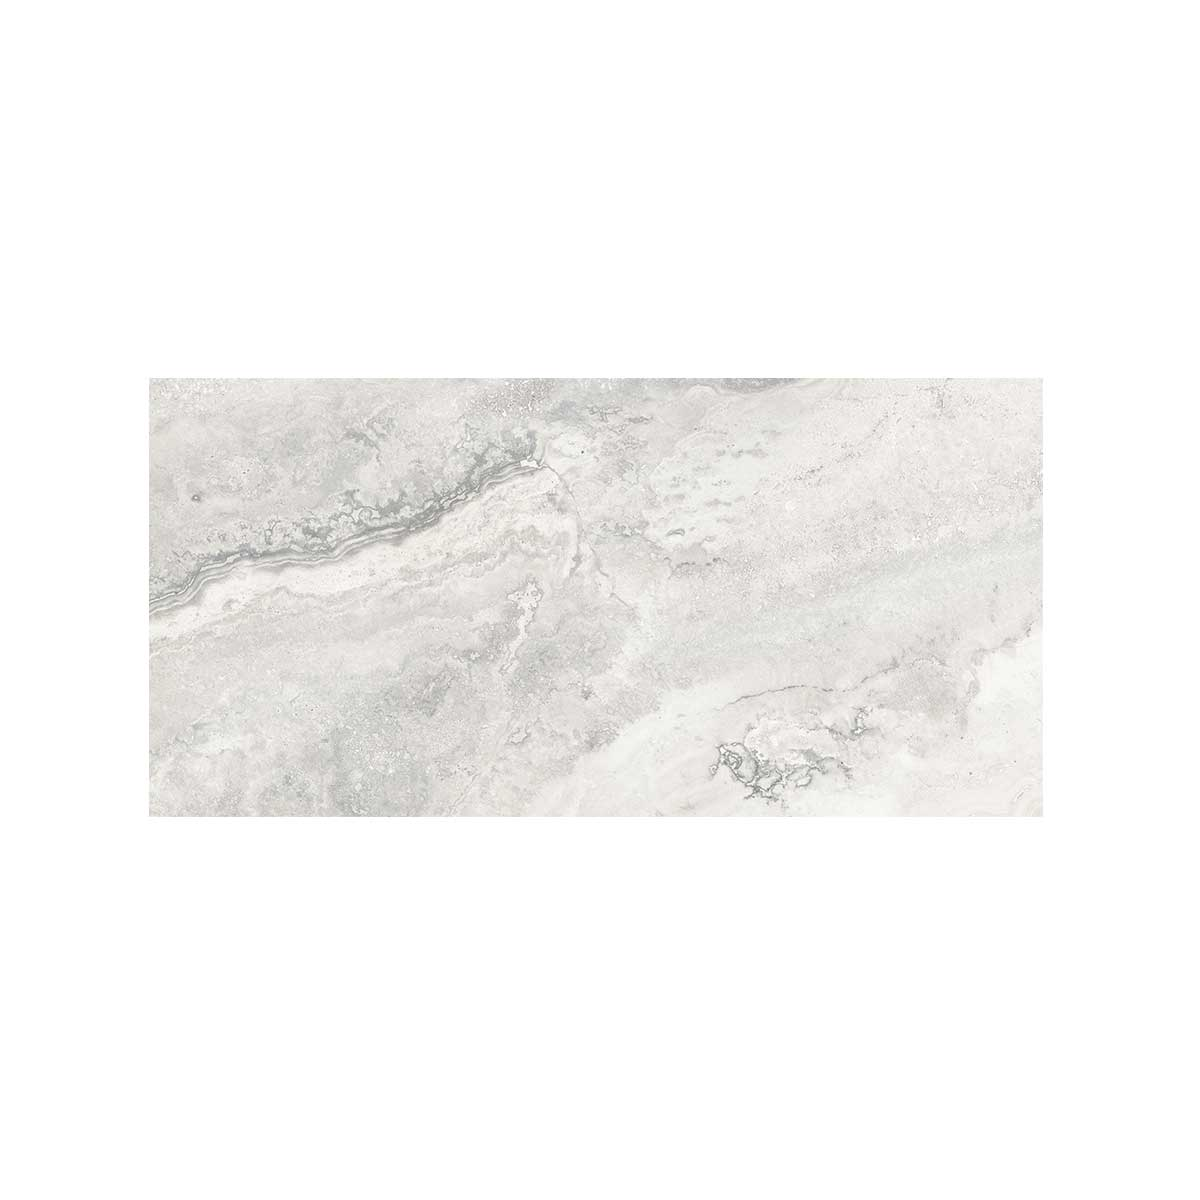 Skyline Grey Ceramic Floor Wall Tile Tiles Coating Productos Orchidceramics